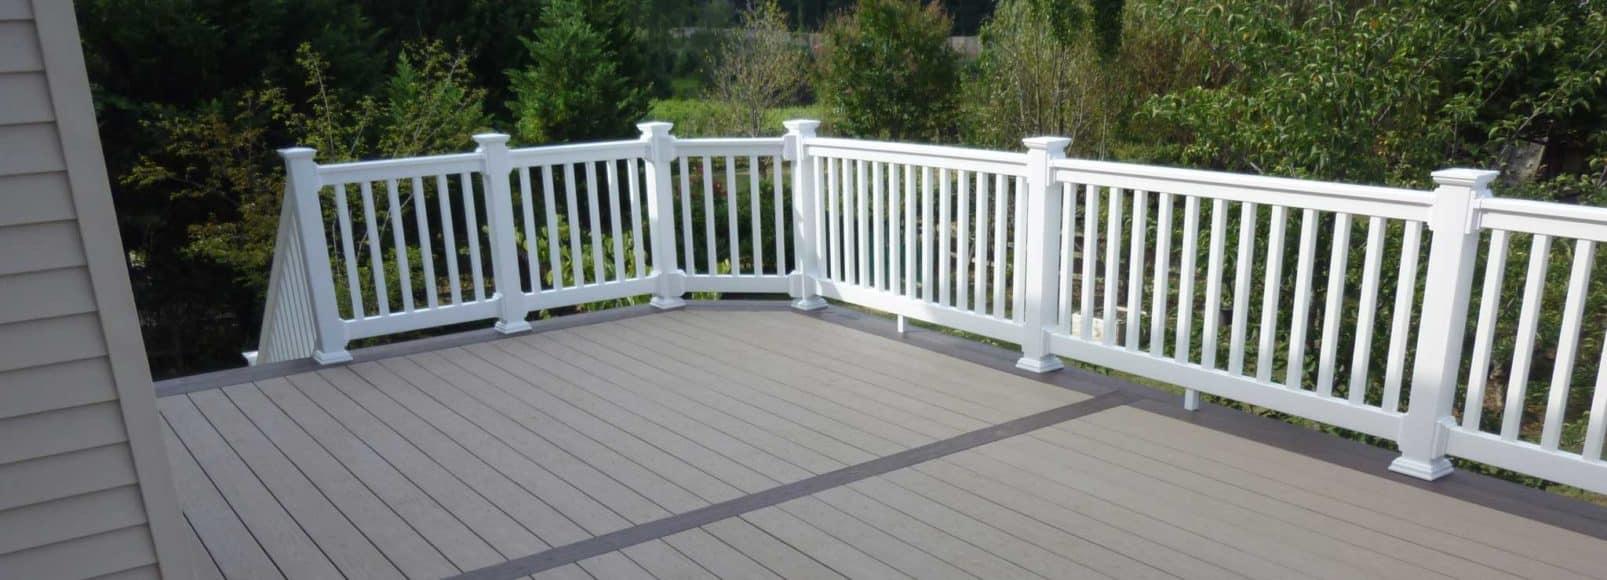 Evergreen Fence Deck Decks 55 Crop